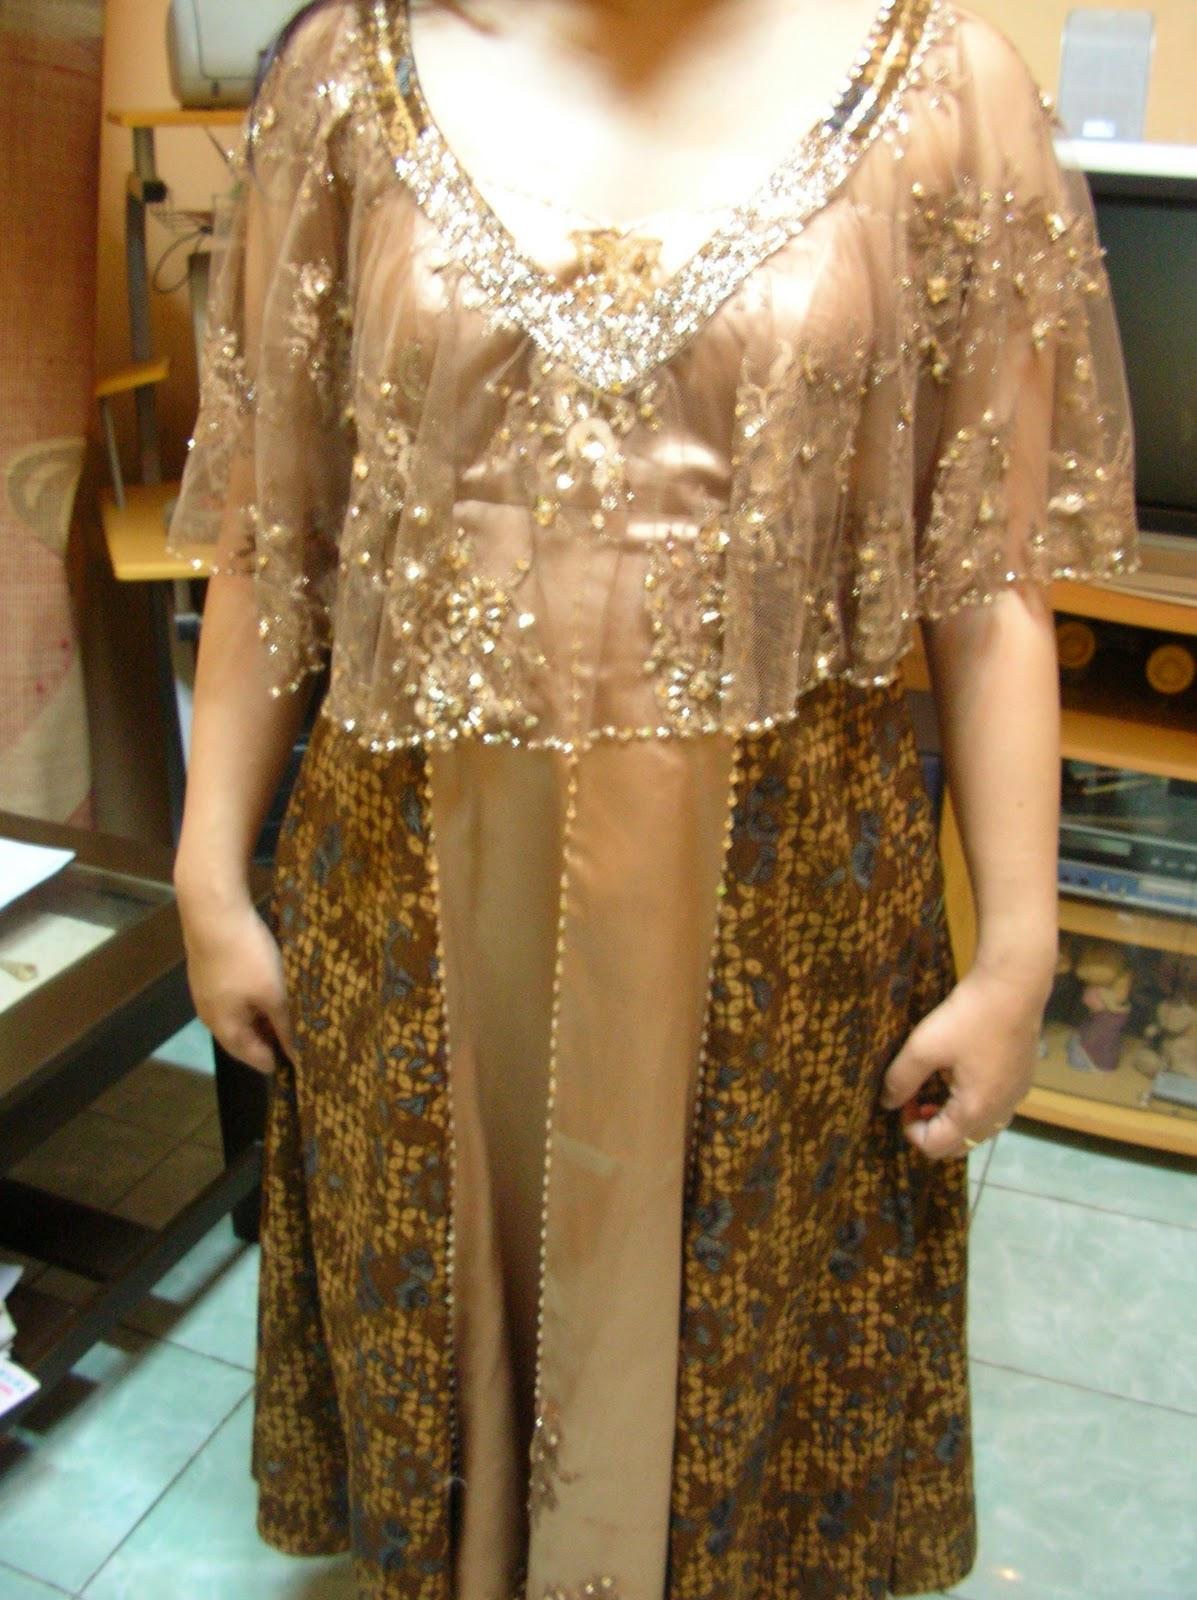 Desain Baju Pesta, Kebaya Modern dan Gaun Pengantin: Gaun Pesta Batik ...